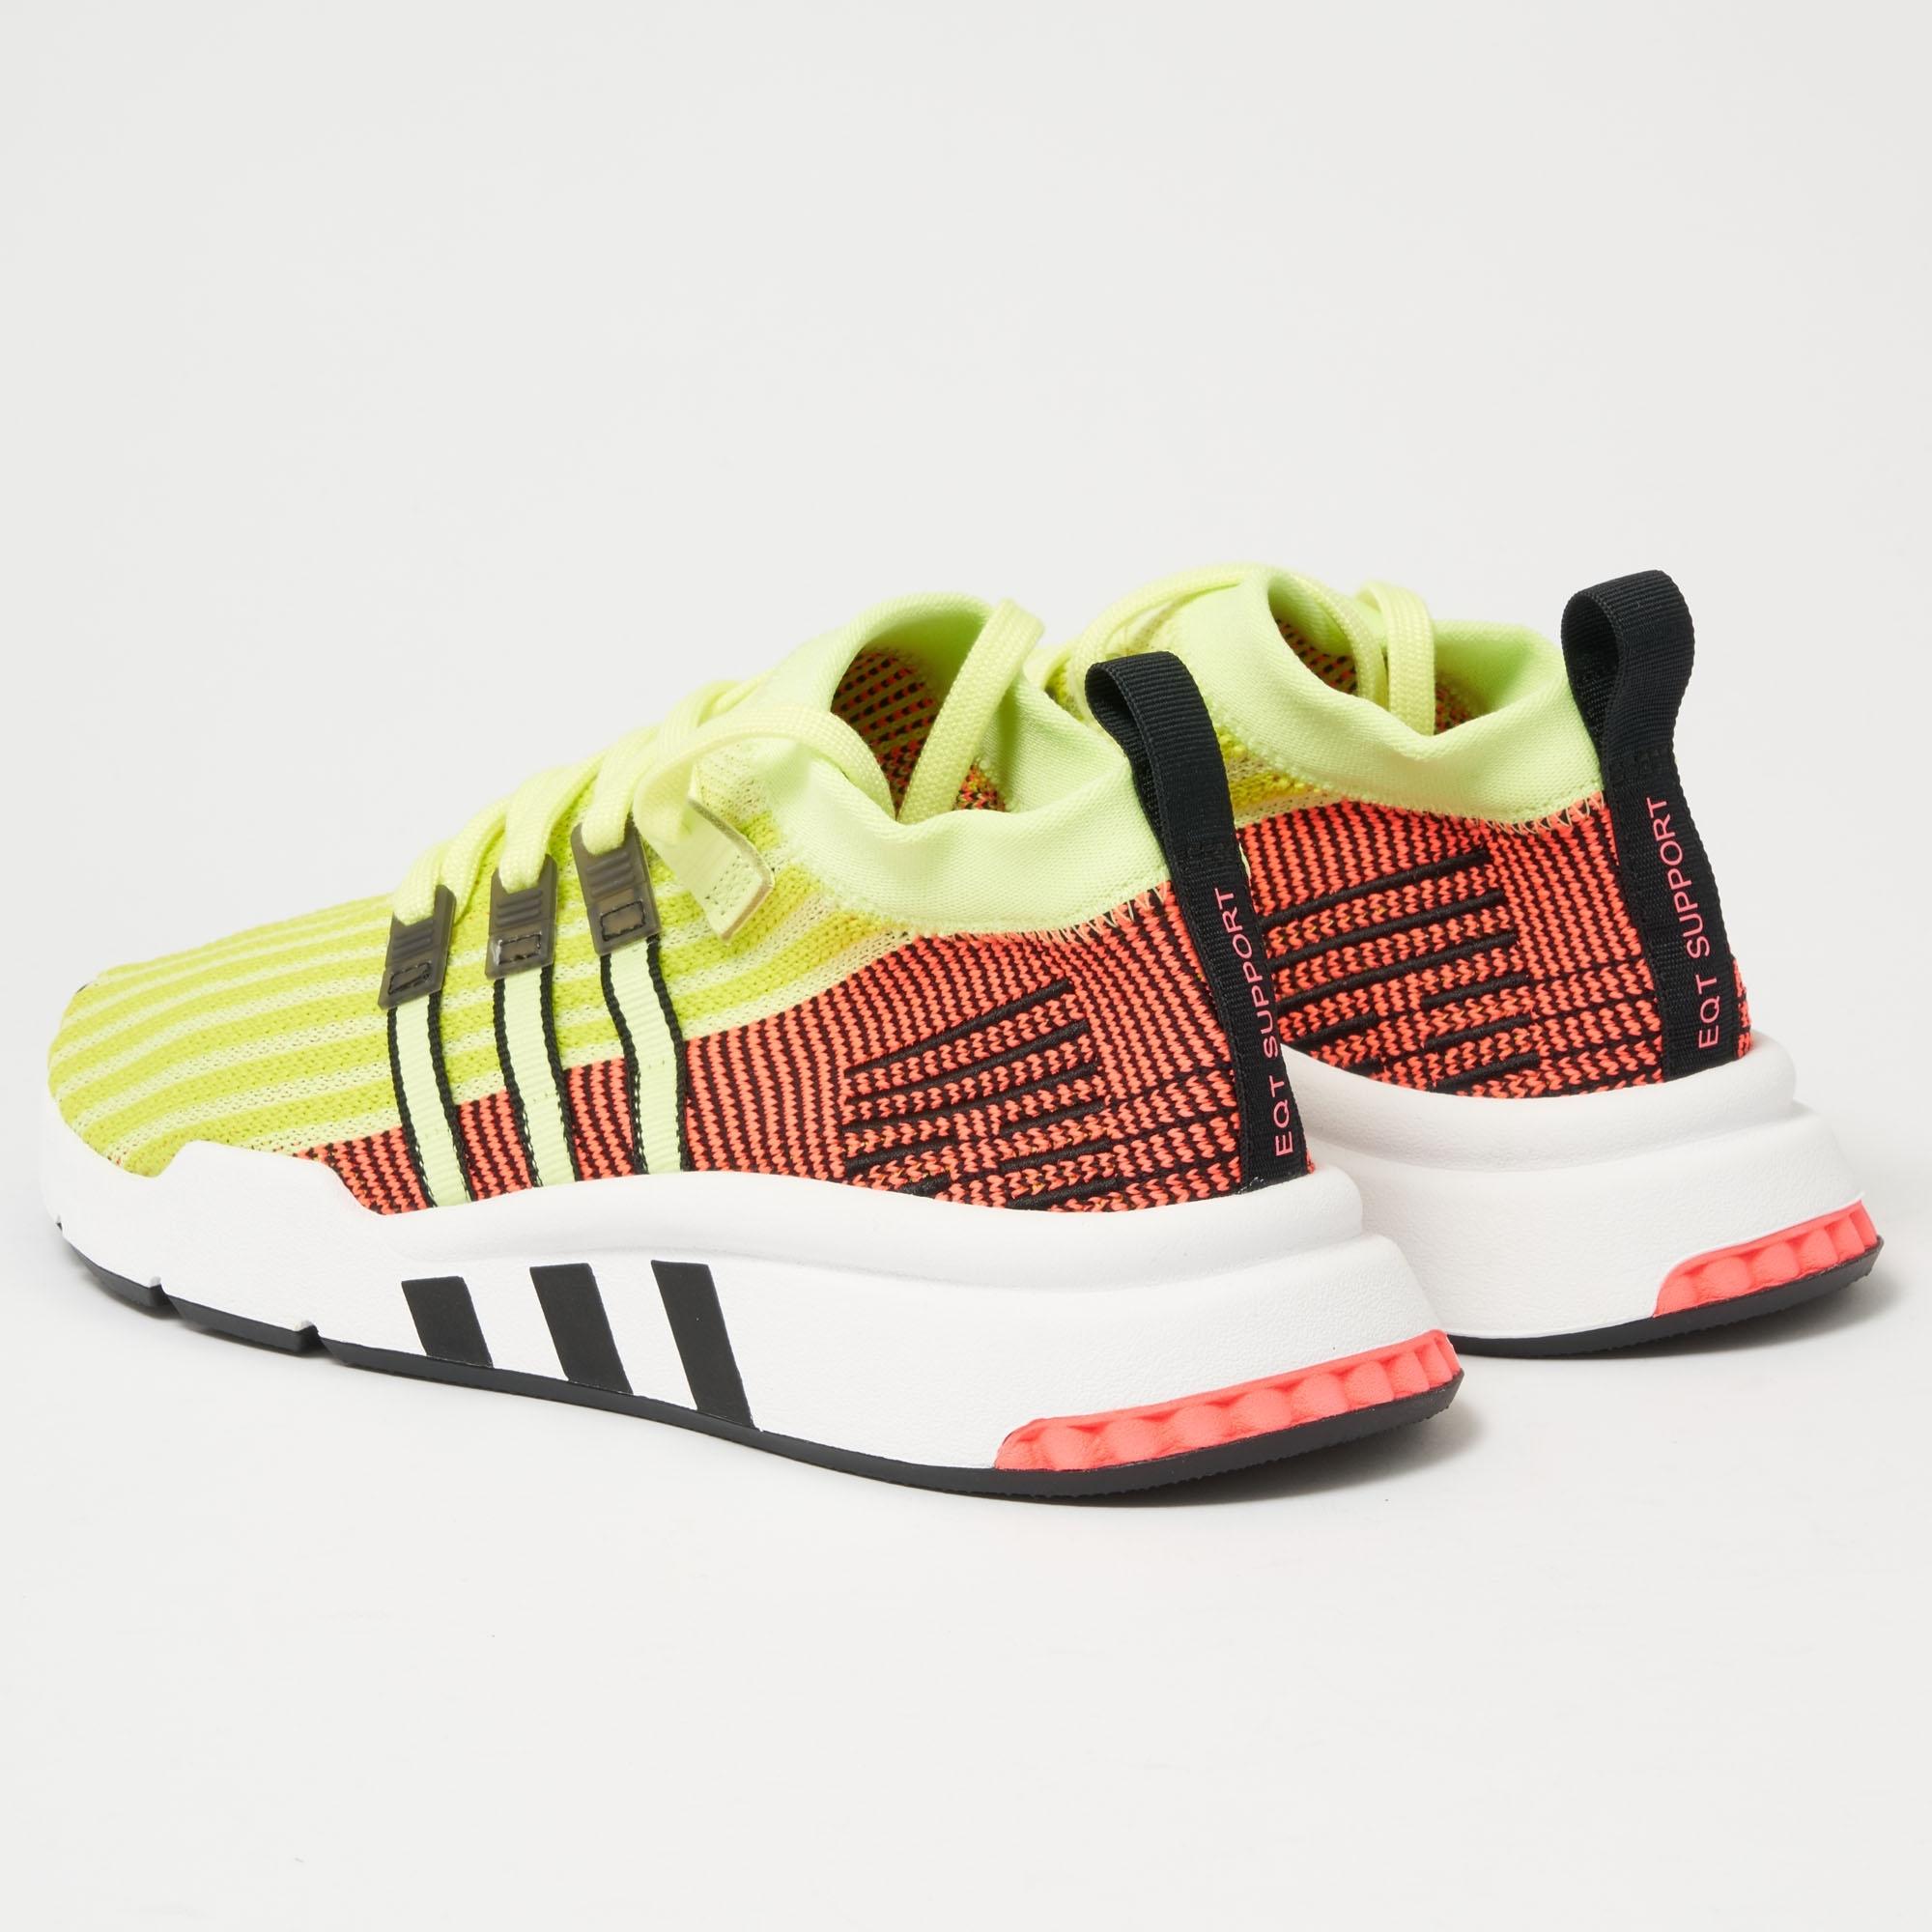 Adidas Originals Eqt Support Mid Adv Primeknit Glow Us Stockists